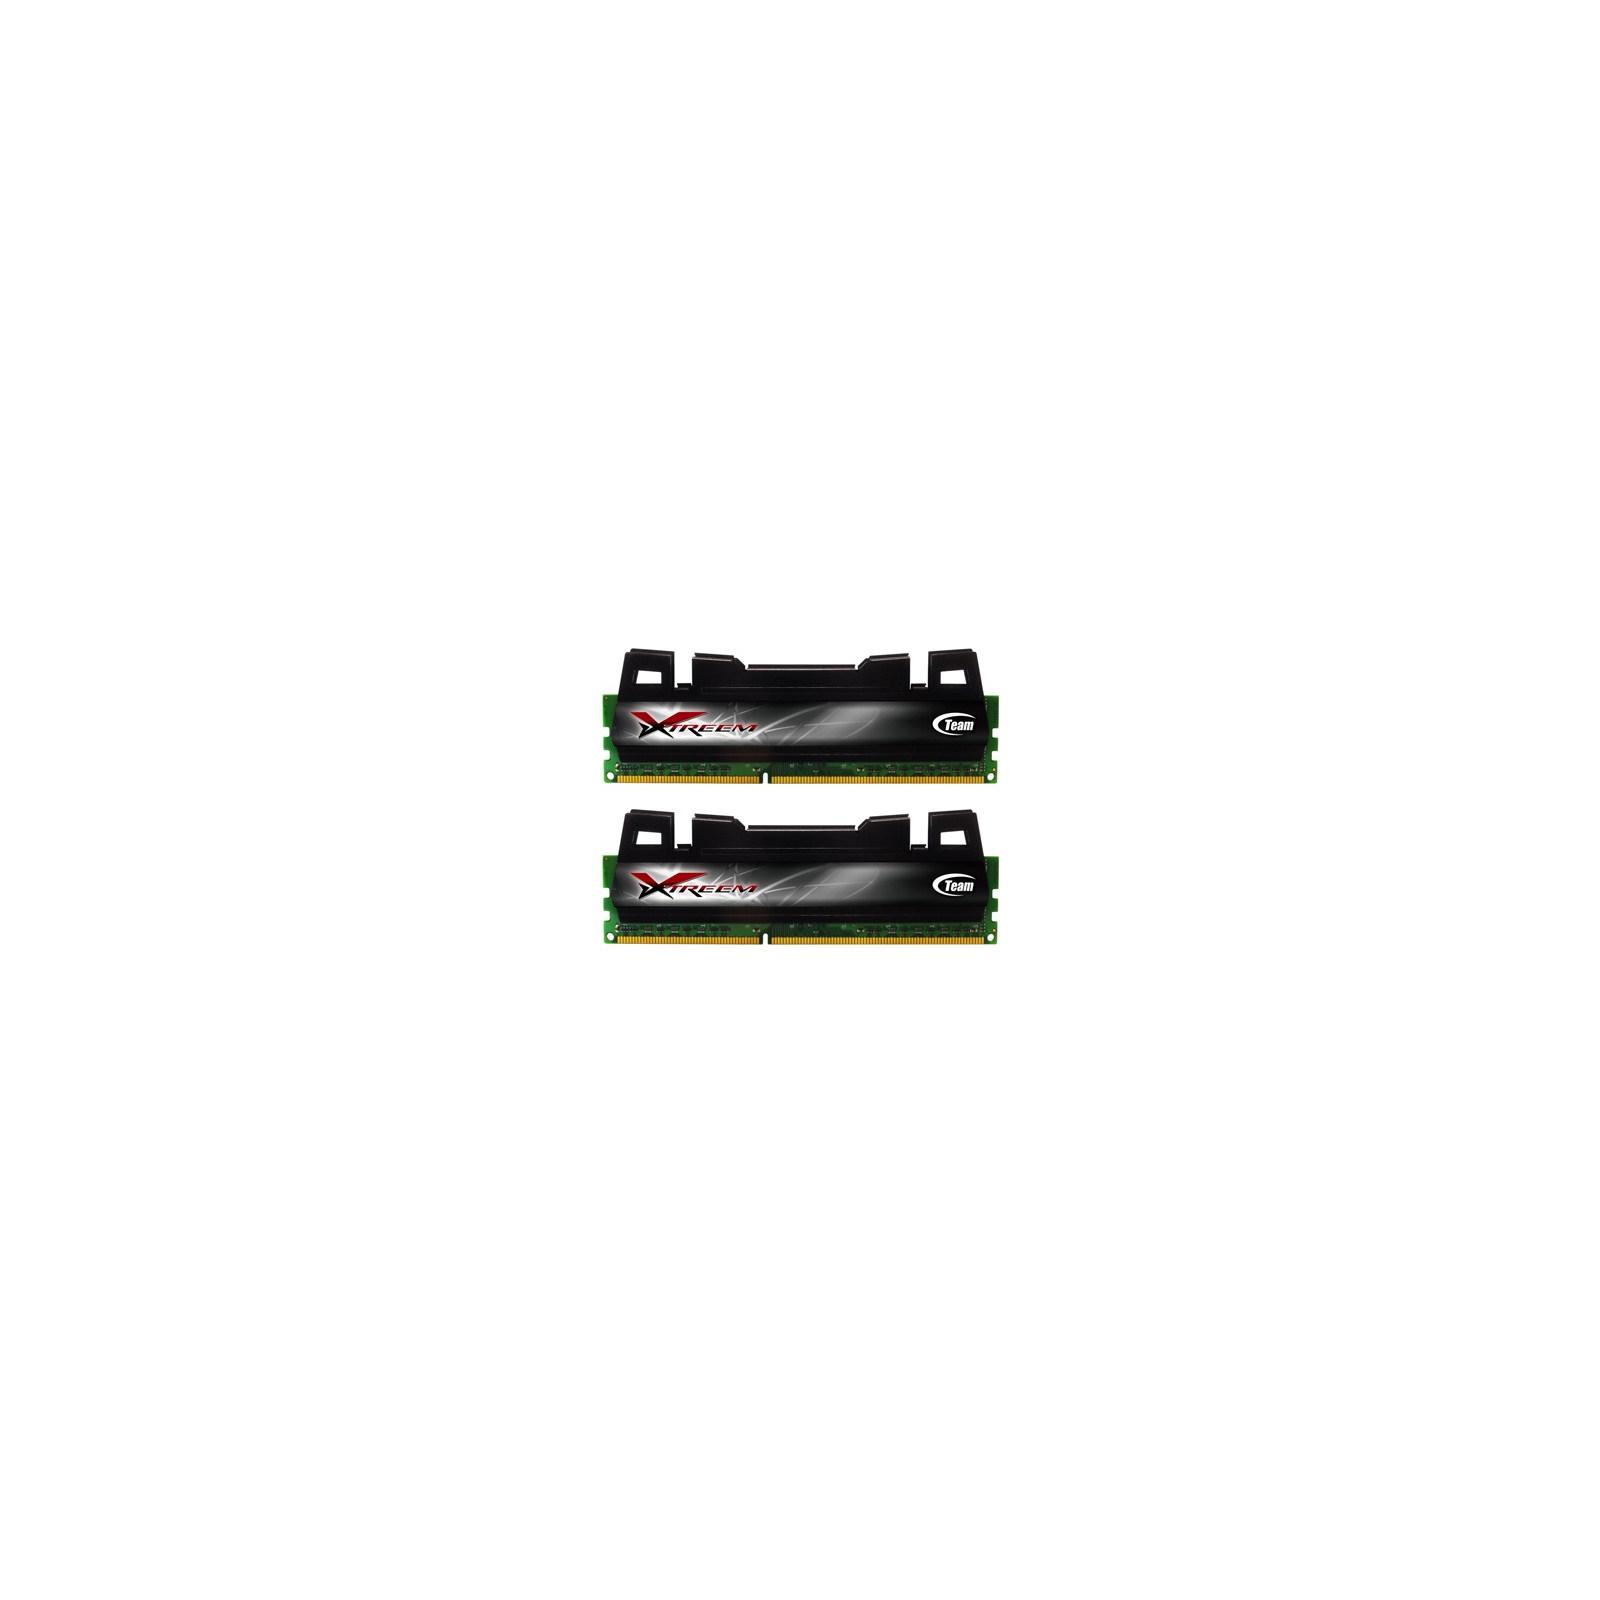 Модуль памяти для компьютера DDR3 8GB (2x4GB) 1866 MHz Team (TXD38G1866HC9KDC01)